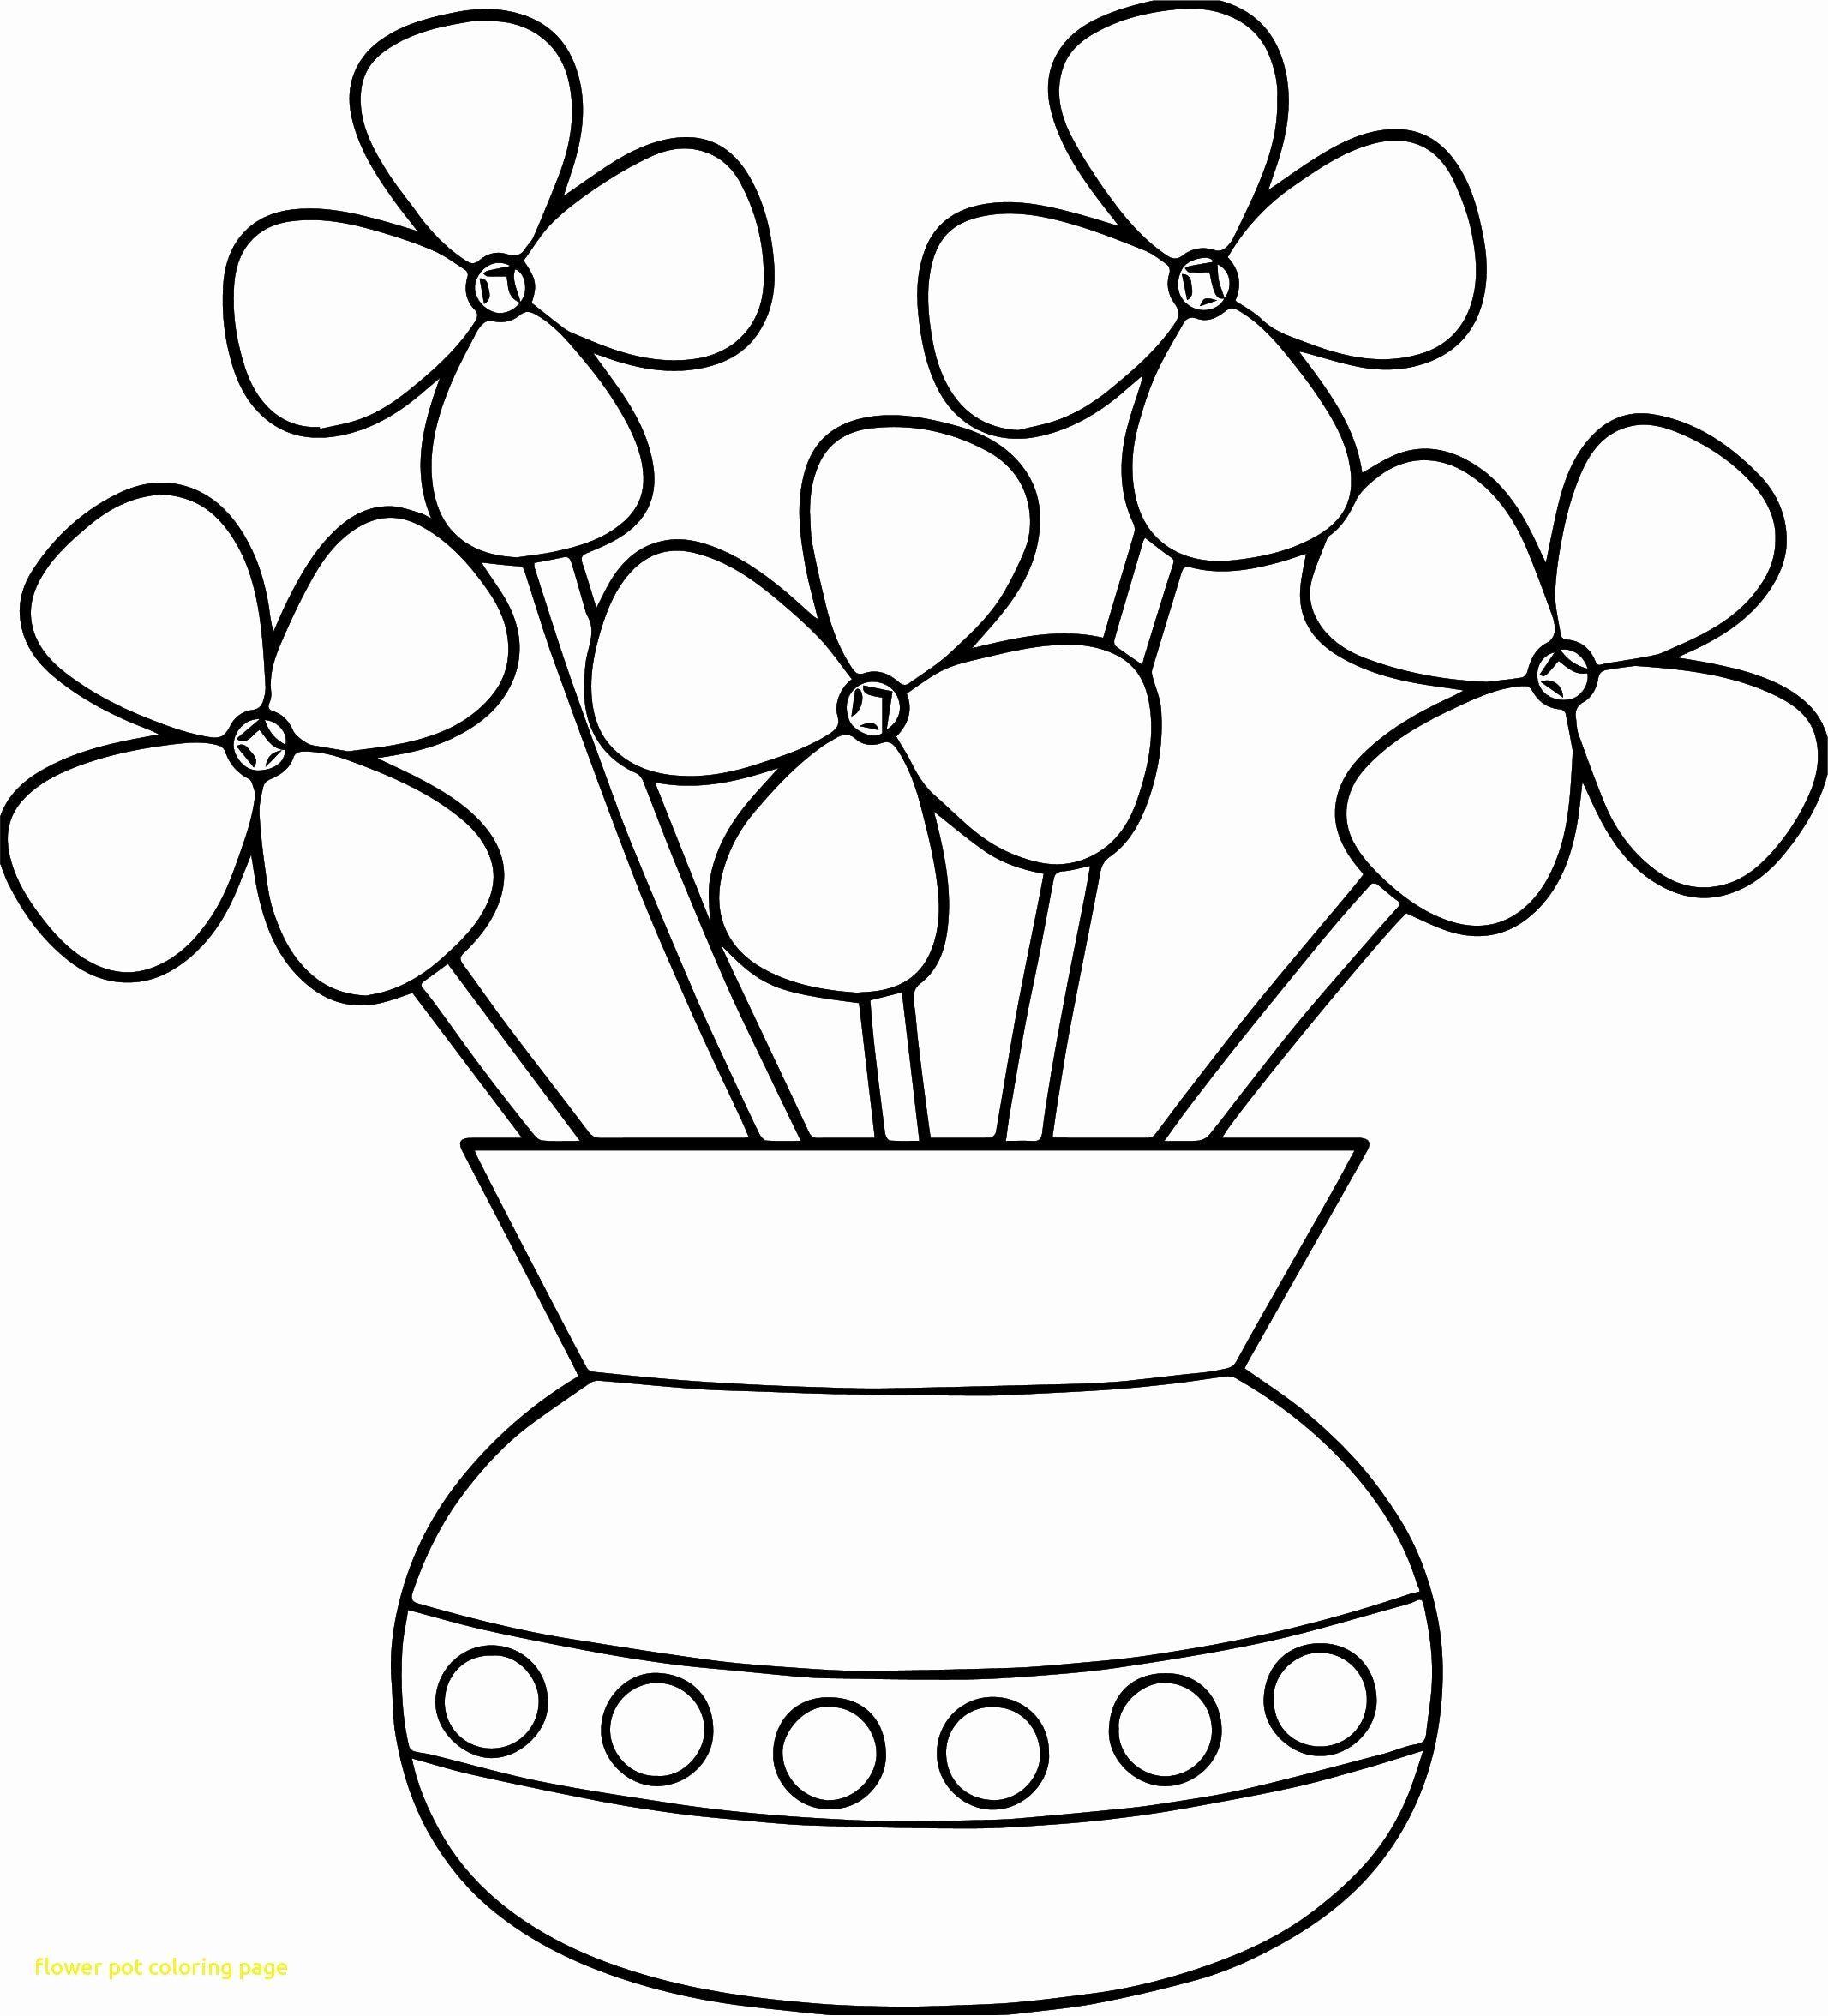 Preschool Coloring Pages Spring in 2020 | Printable flower ...